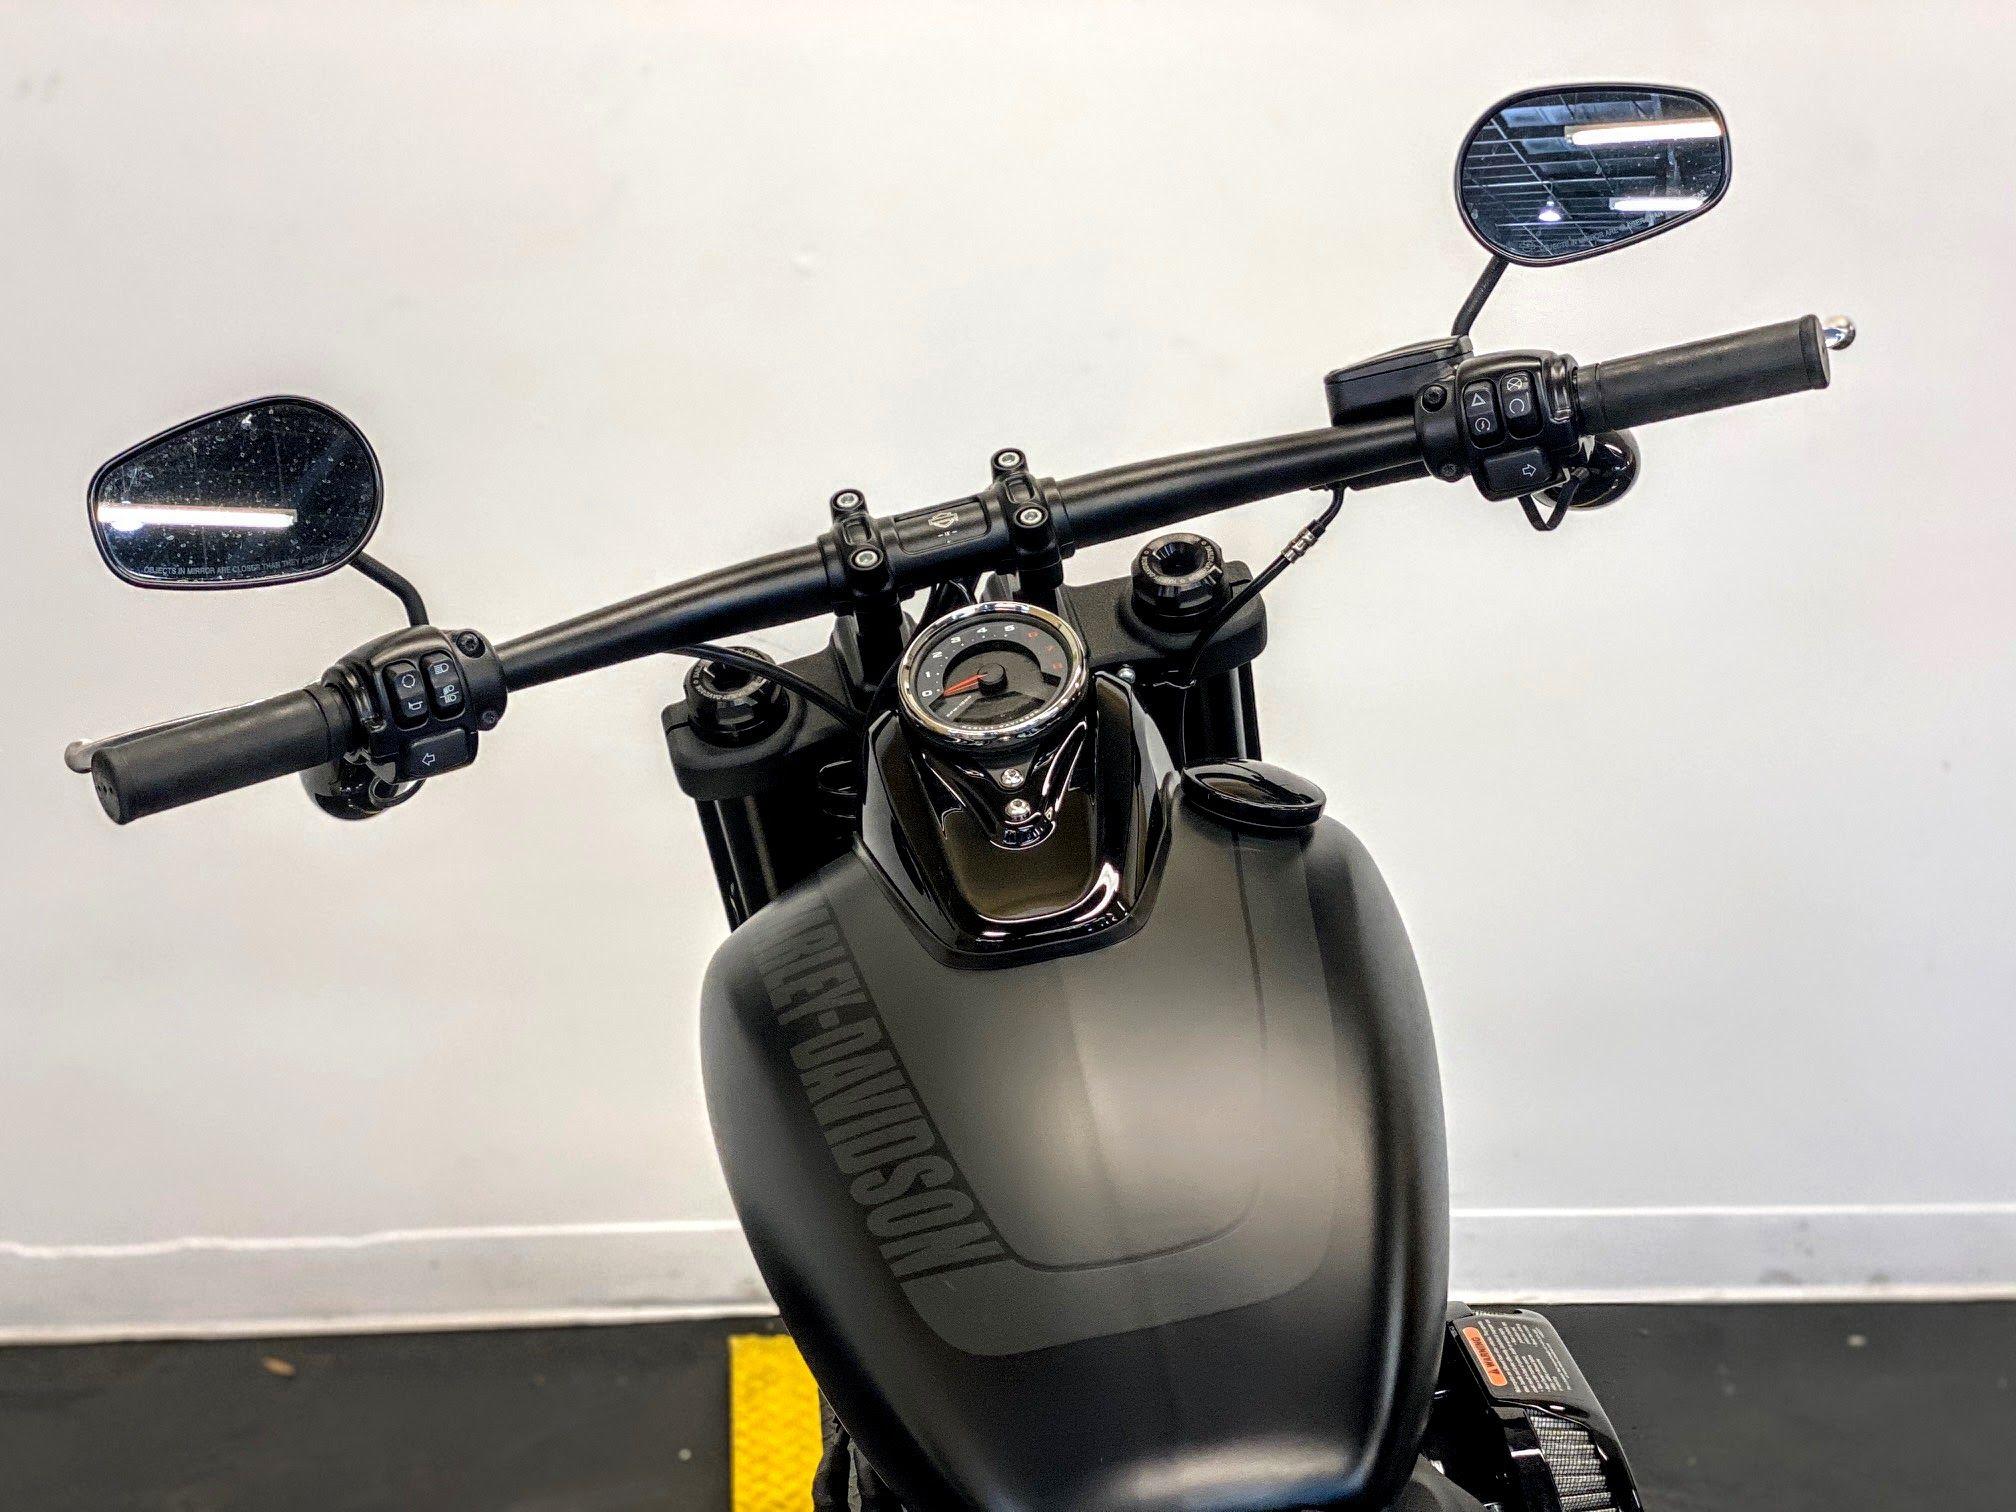 Pre-Owned 2018 Harley-Davidson Fat Bob 114 FXFBS